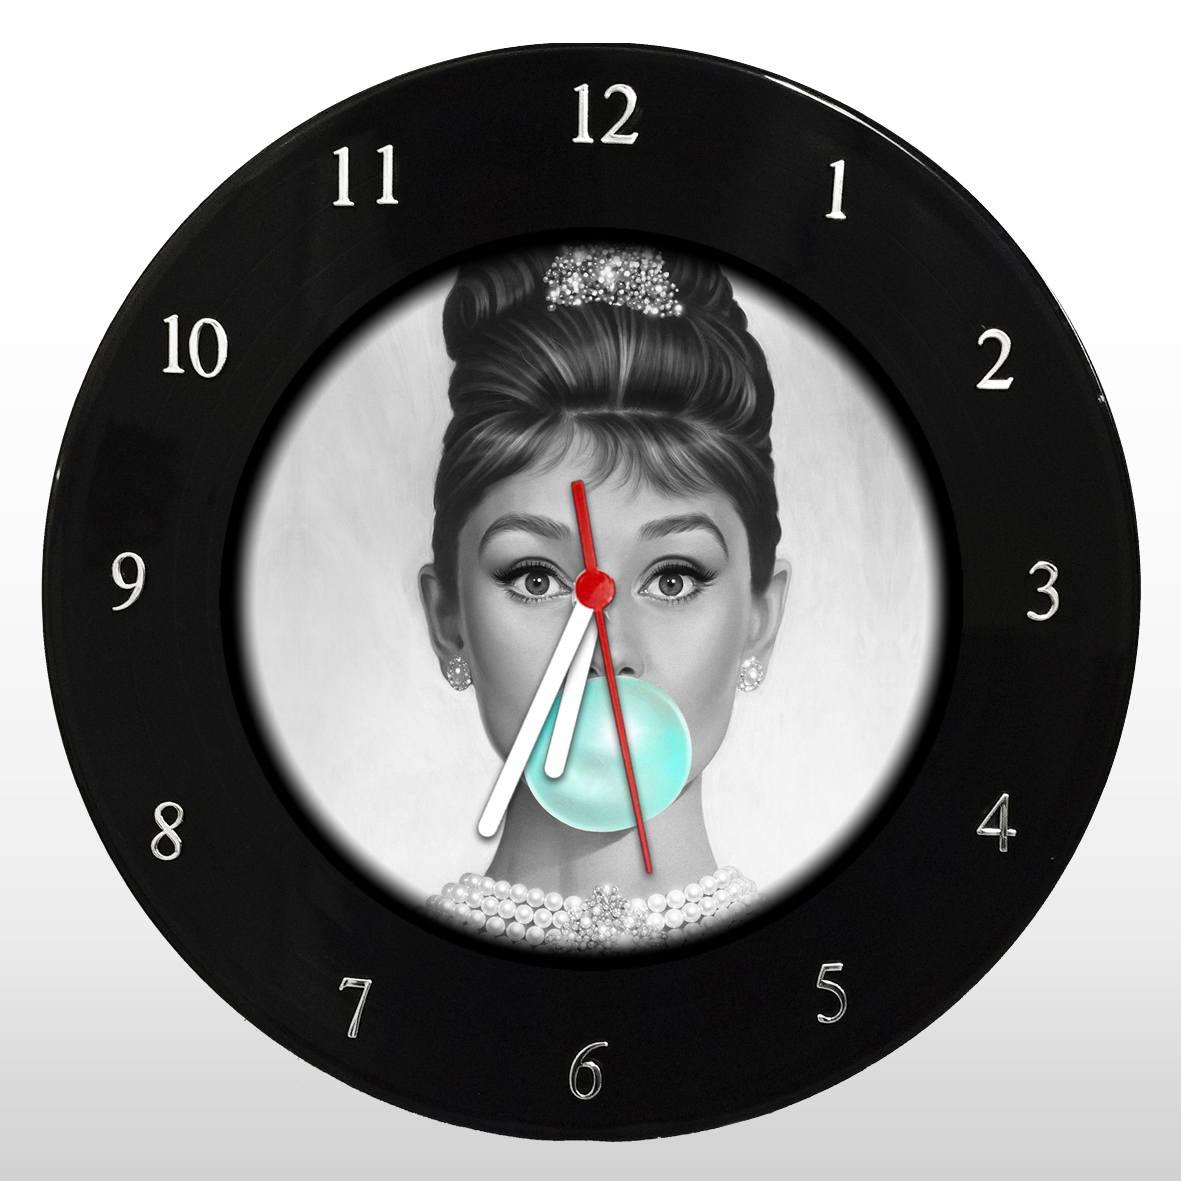 Audrey Hepburn - Relógio de Parede em Disco de Vinil - Mr. Rock